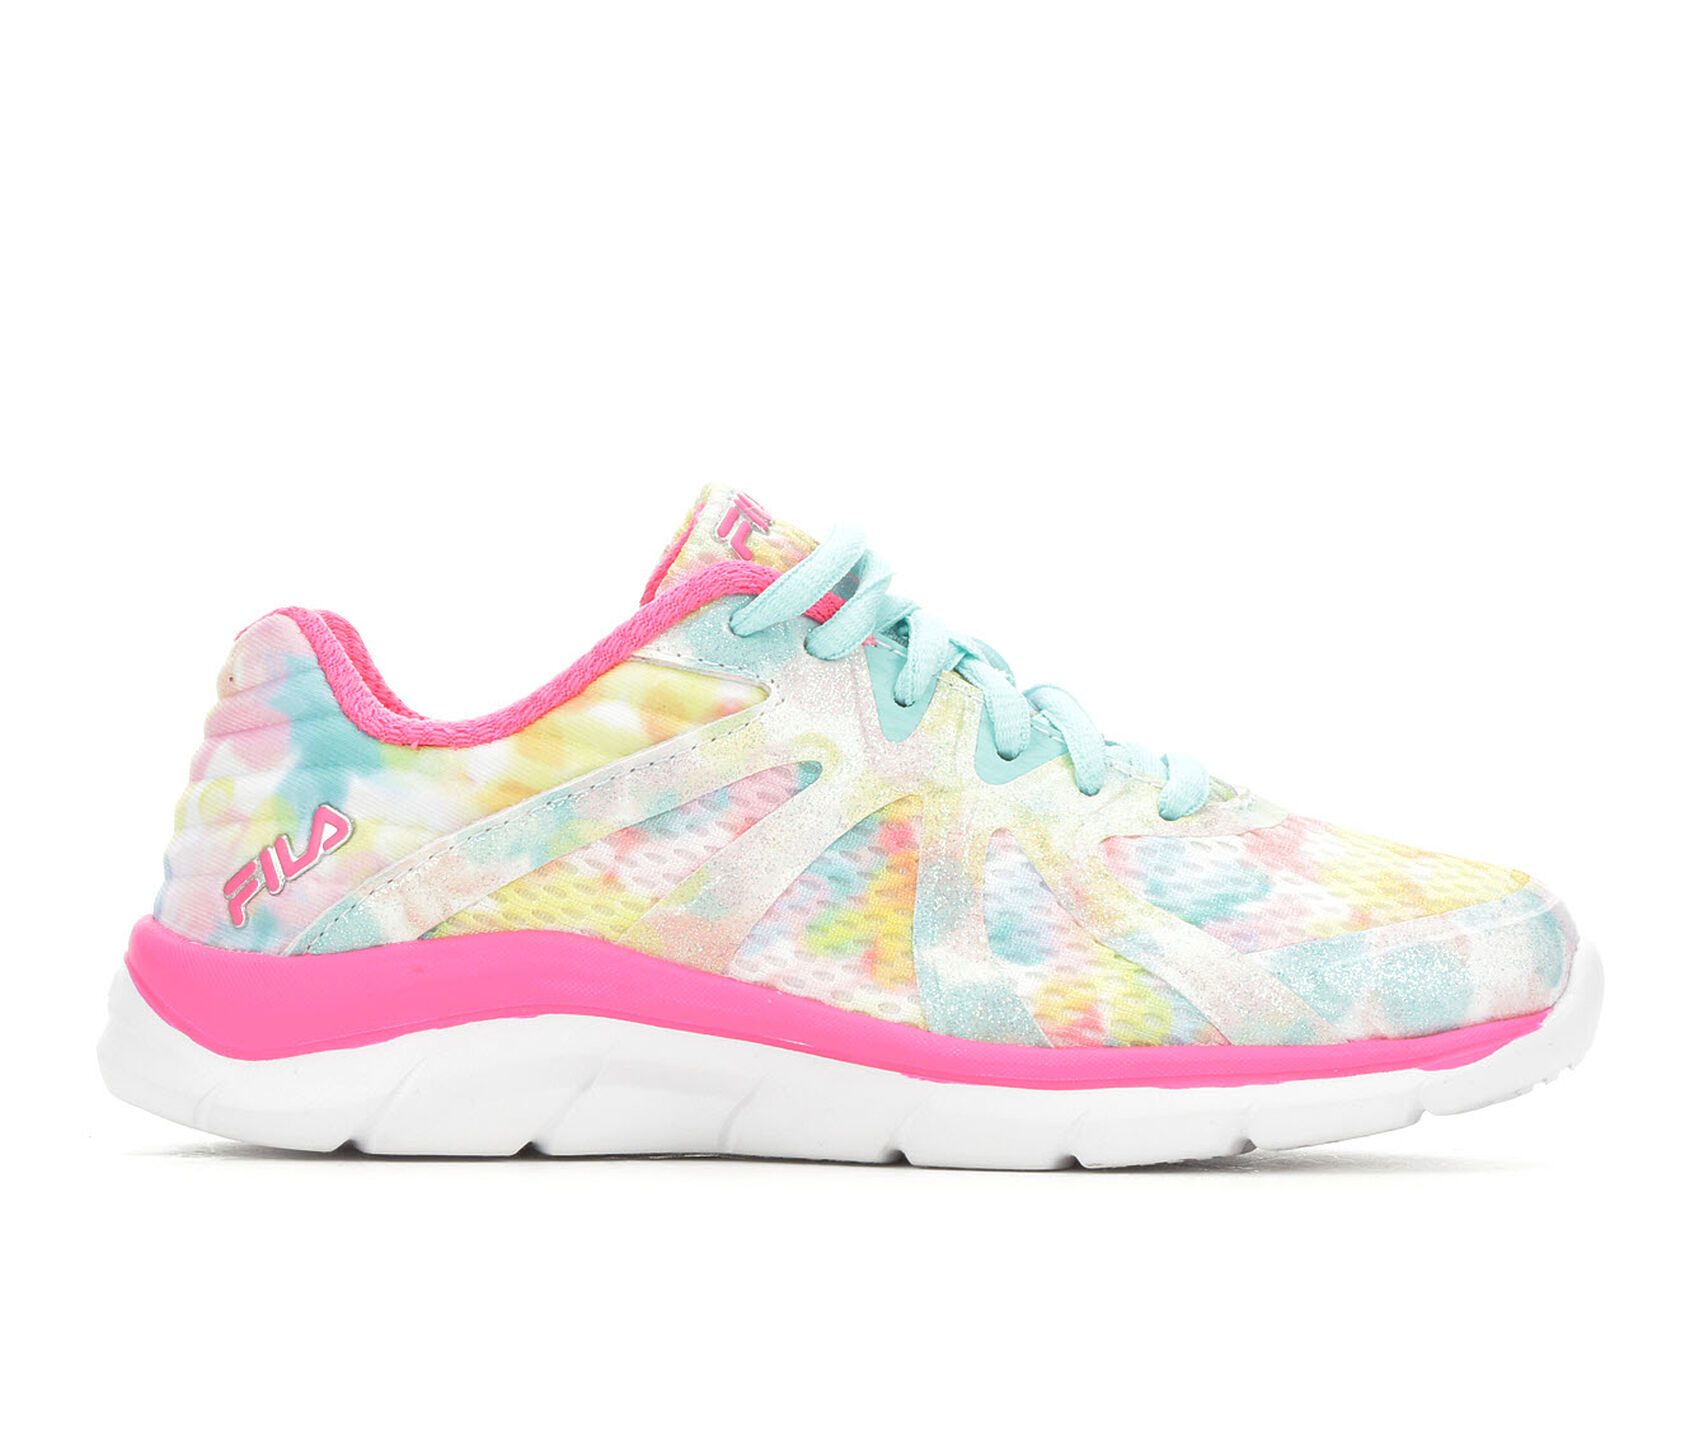 5408ce56692b5 Girls' Fila Little Kid & Big Kid Fraction 3 Glitter Running Shoes